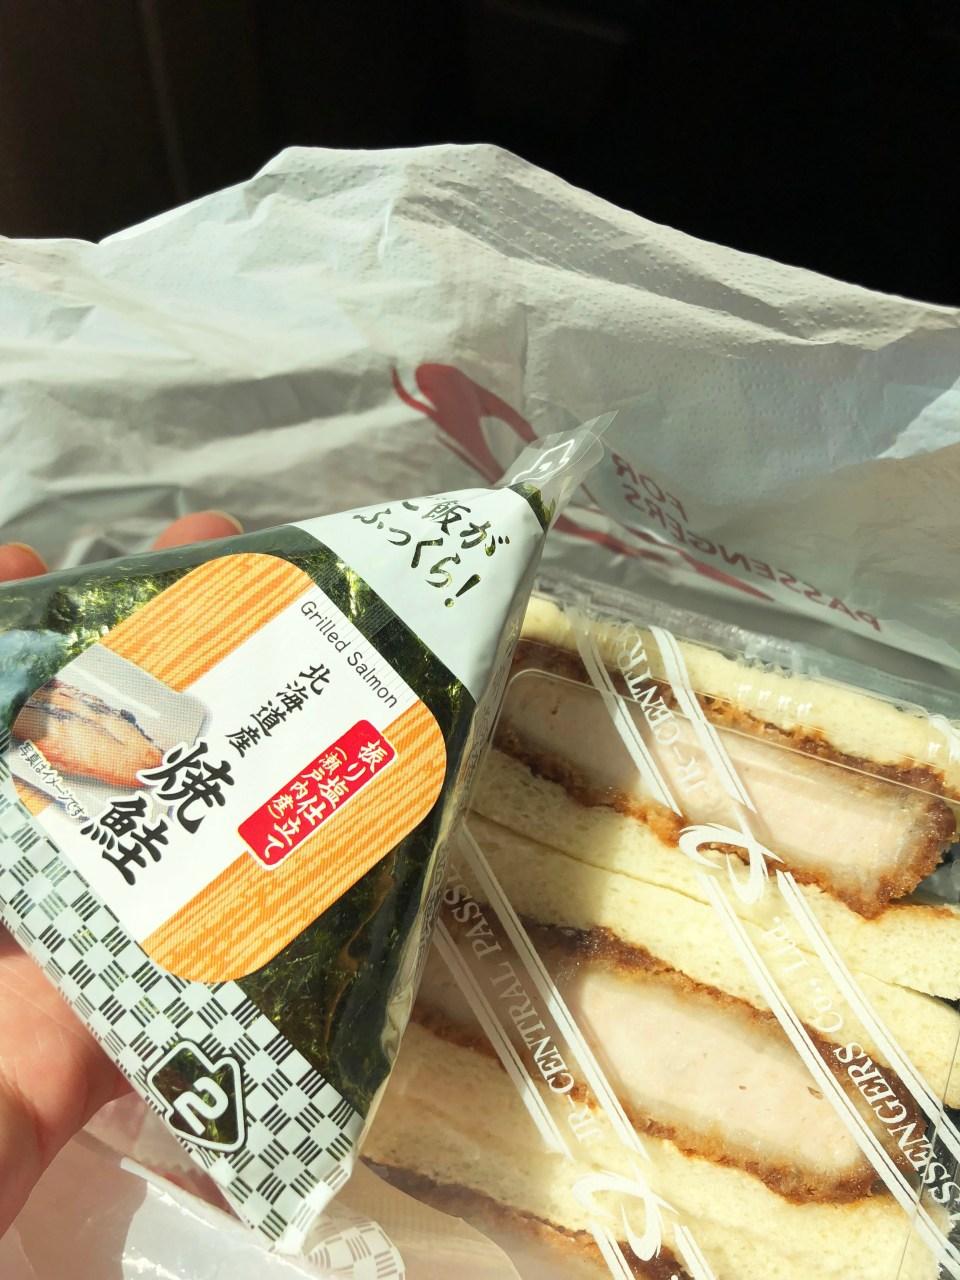 Seaweed & Salmon Sandwich + Katsu Sandwich